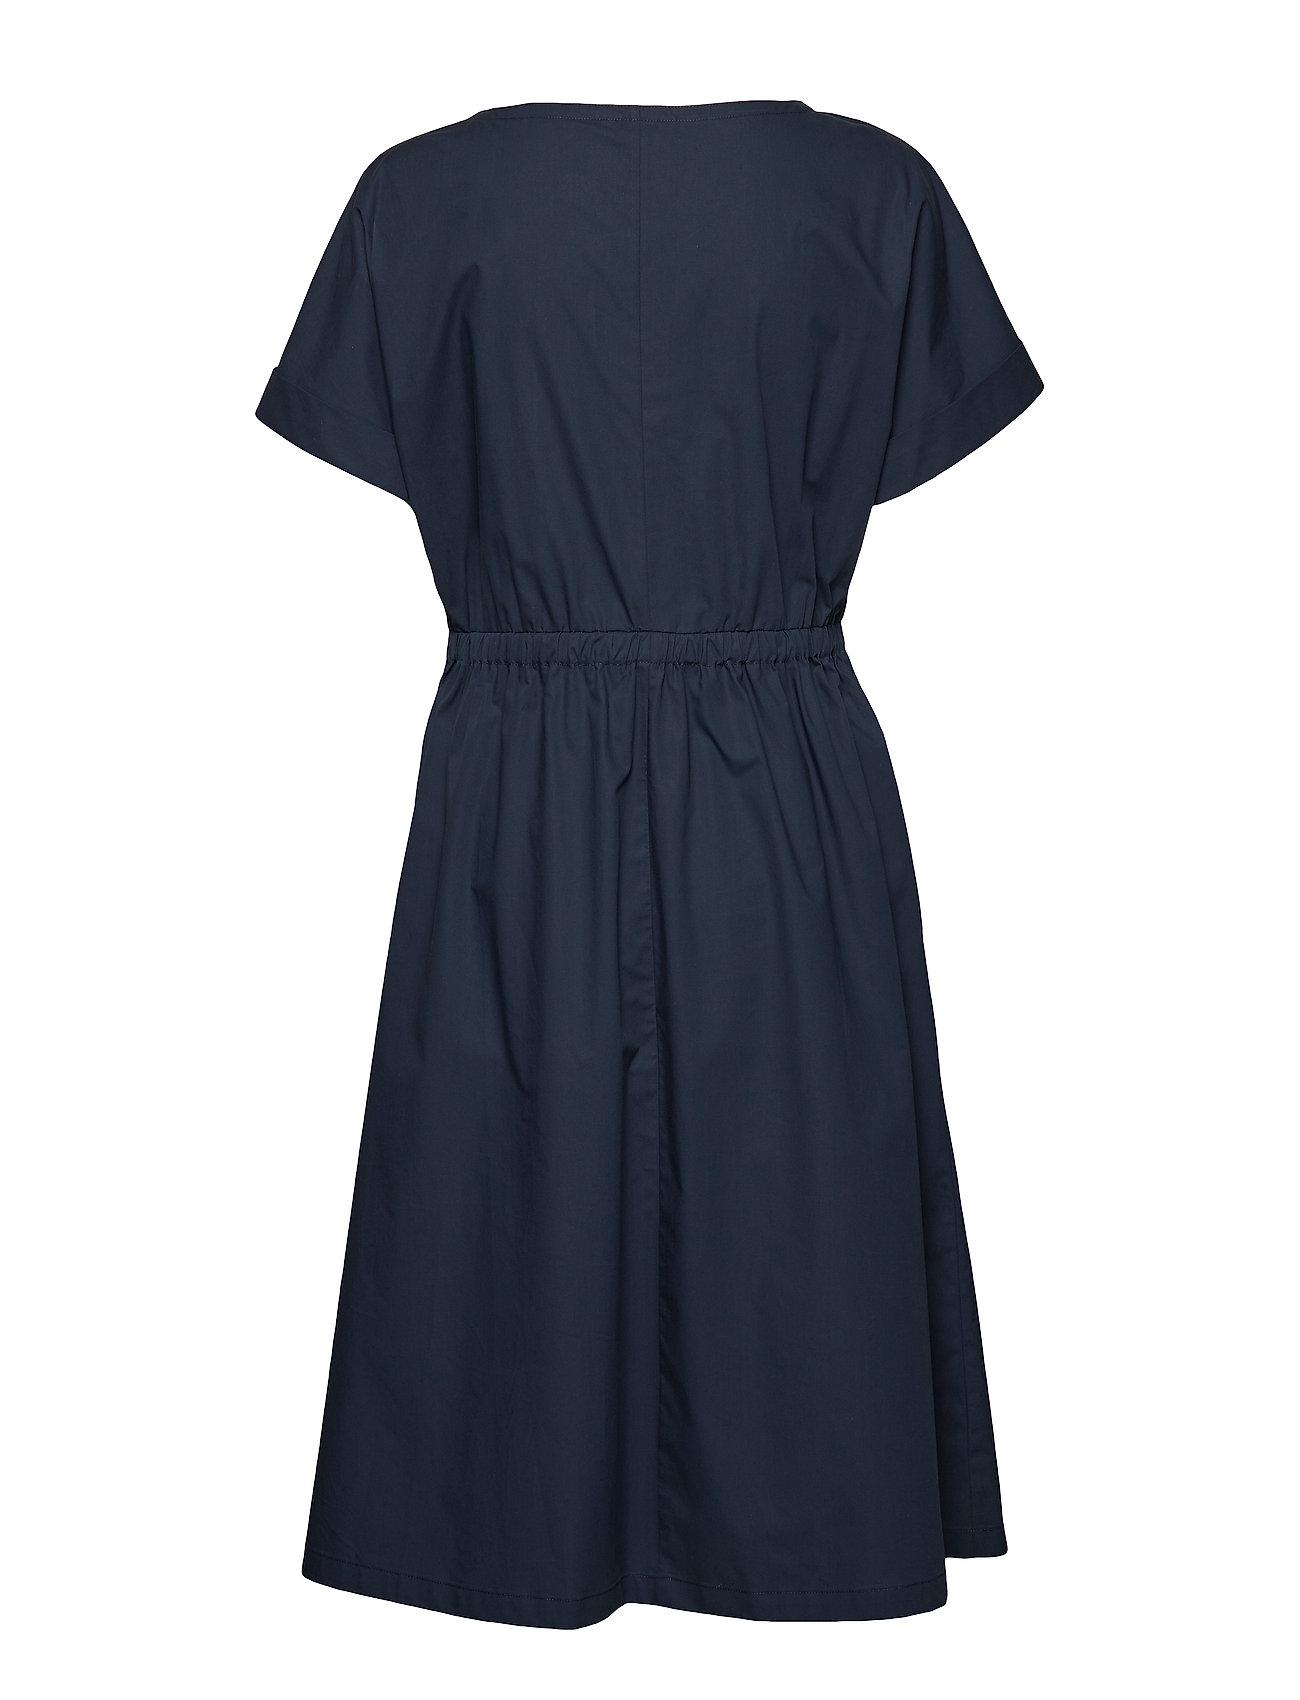 6c06a0932fa1 ... Marimekko PIIRI SOLID Dress Klänningar Klänningar Klänningar 0eb862